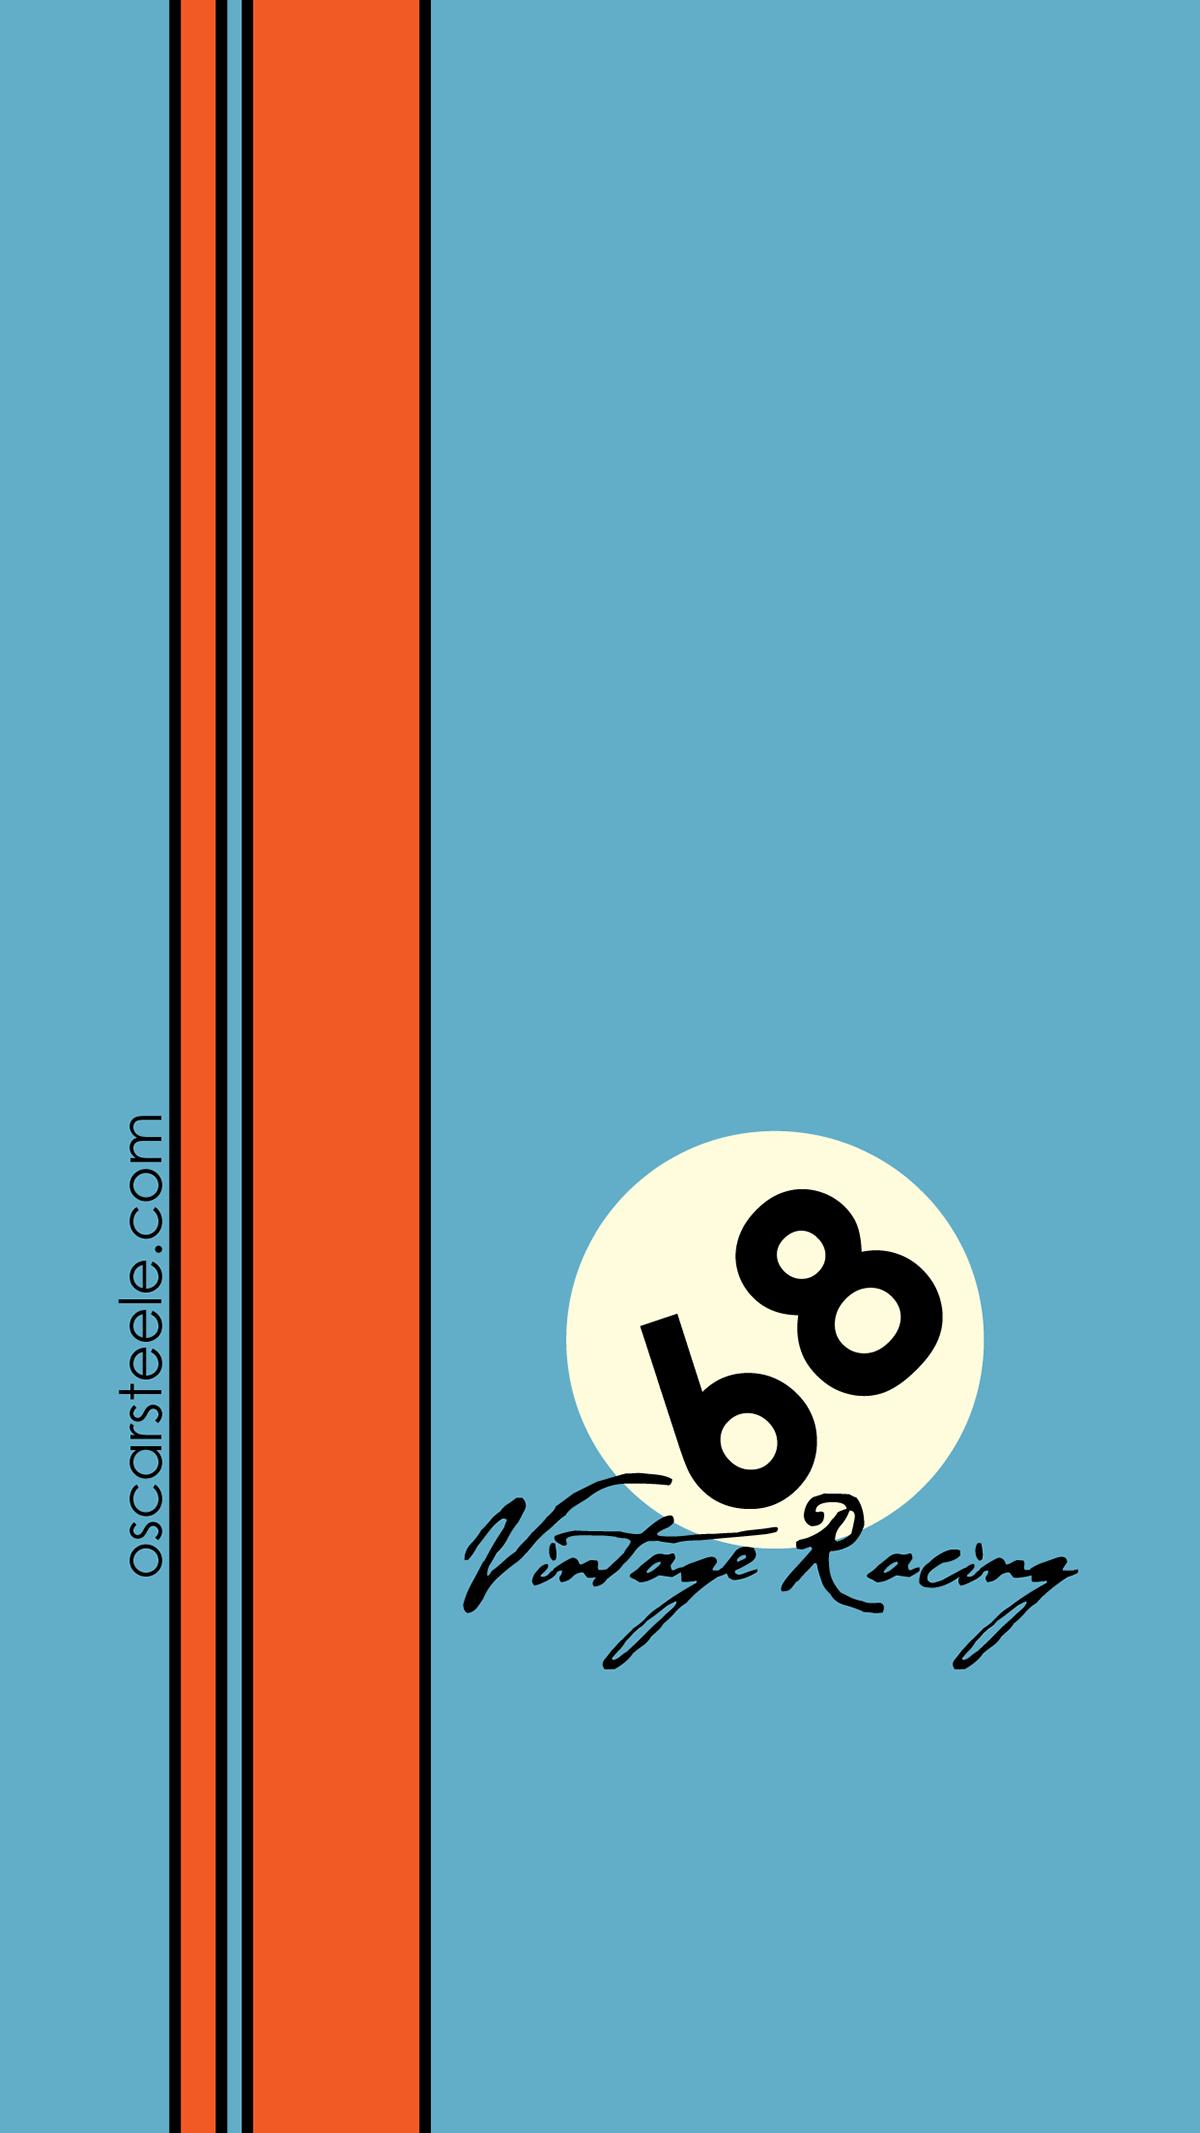 68 Vintage Racing Iphone Ios 6 Plus Wallpaper On Behance Gulf